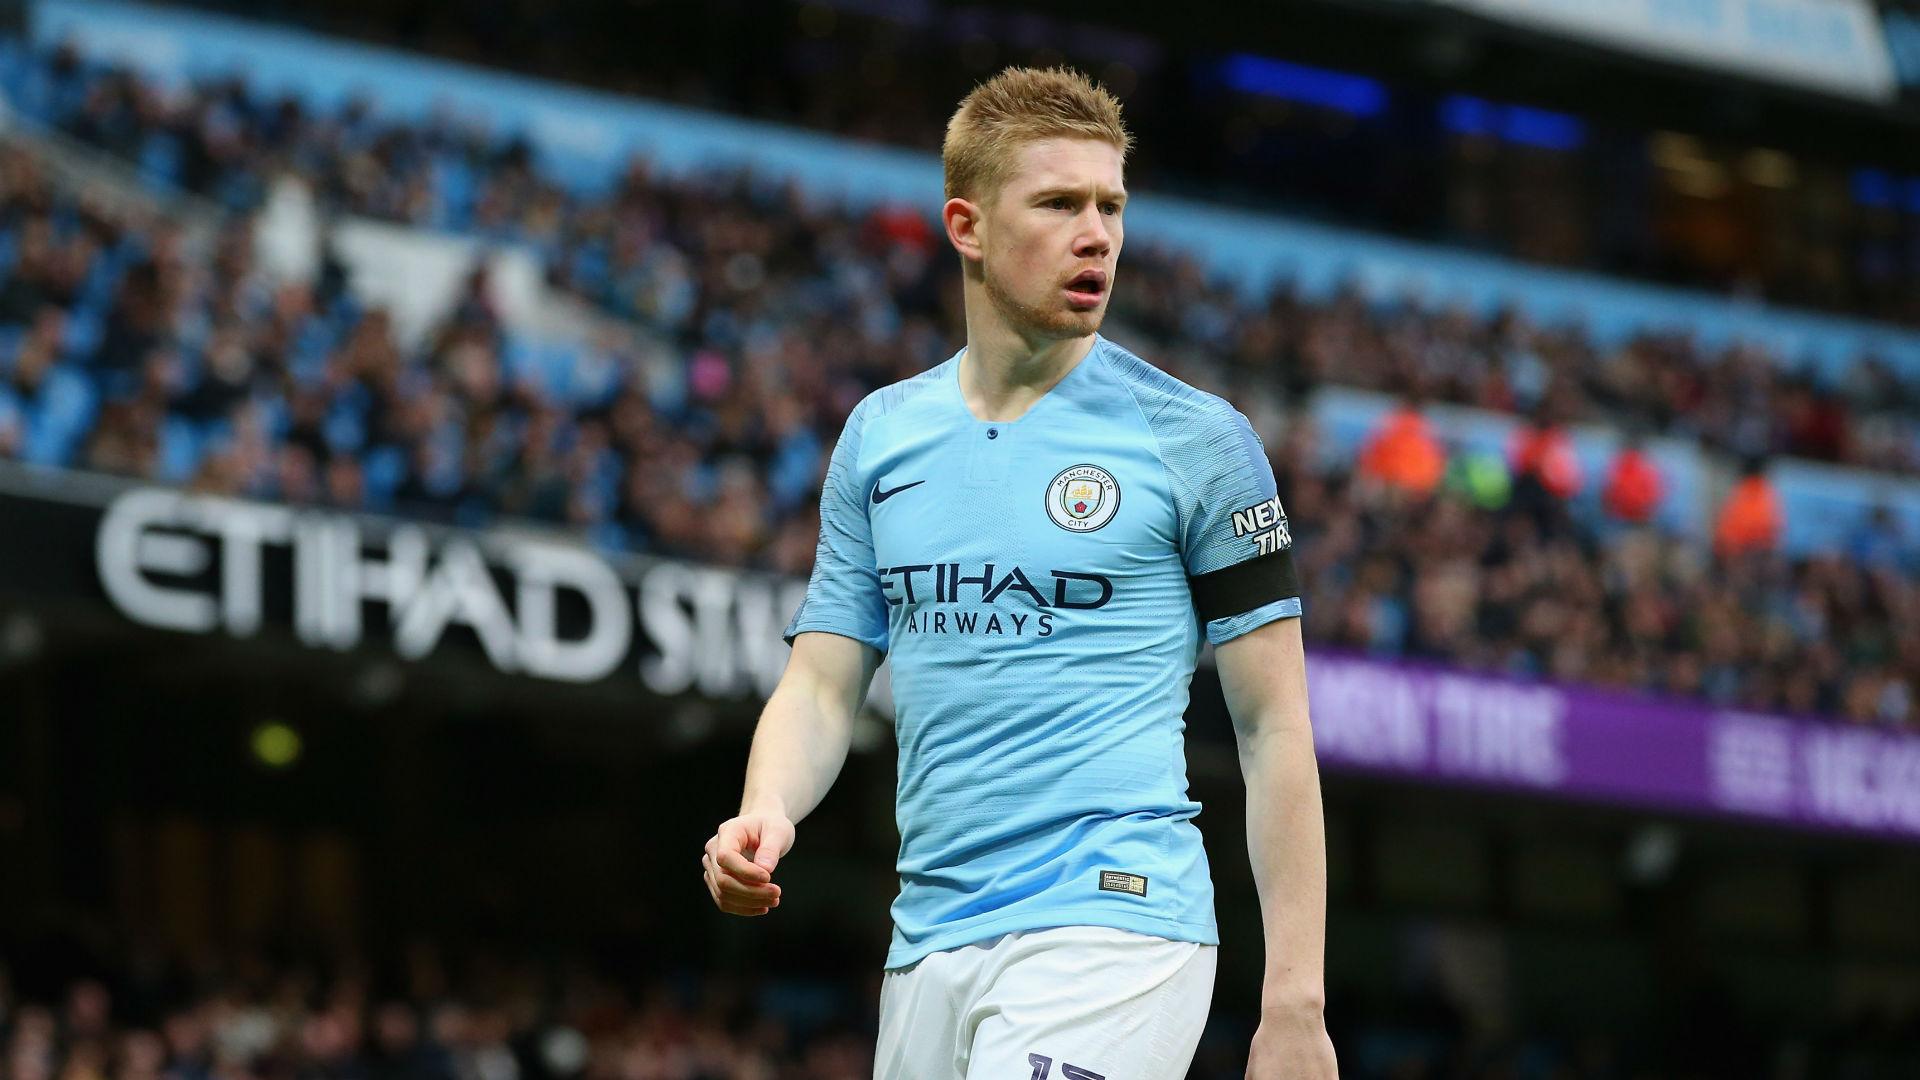 Chelsea Vs Man City Live Stream: Carabao Cup, Chelsea Vs. Manchester City: TV, LIVE-STREAM